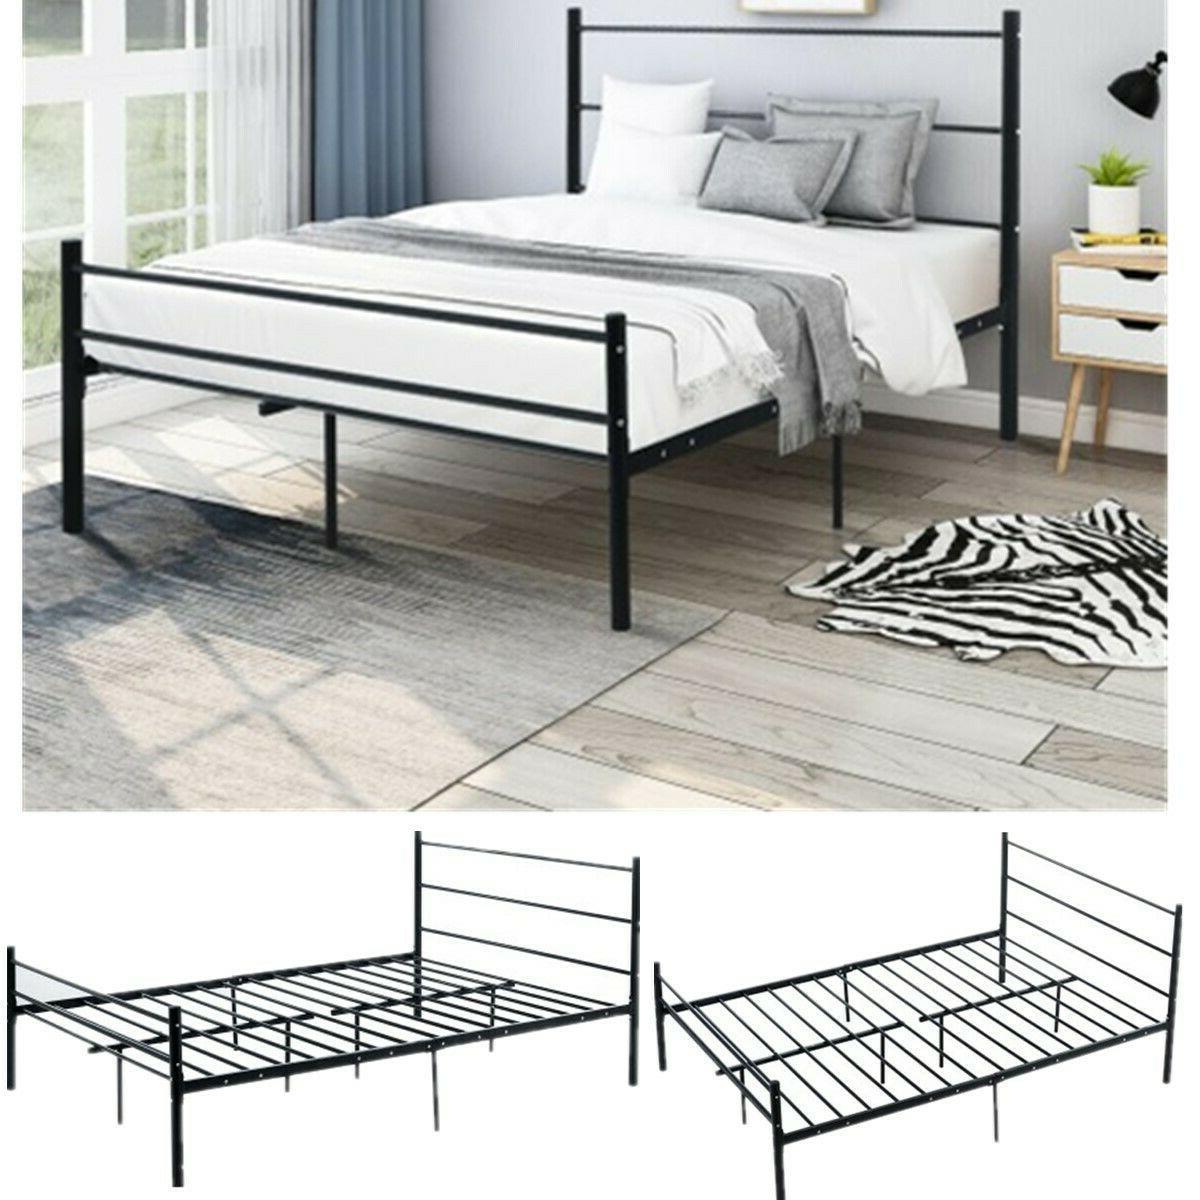 "Full Size 22.8"" inch Platform Bed Frame Heavy Duty Mattress"